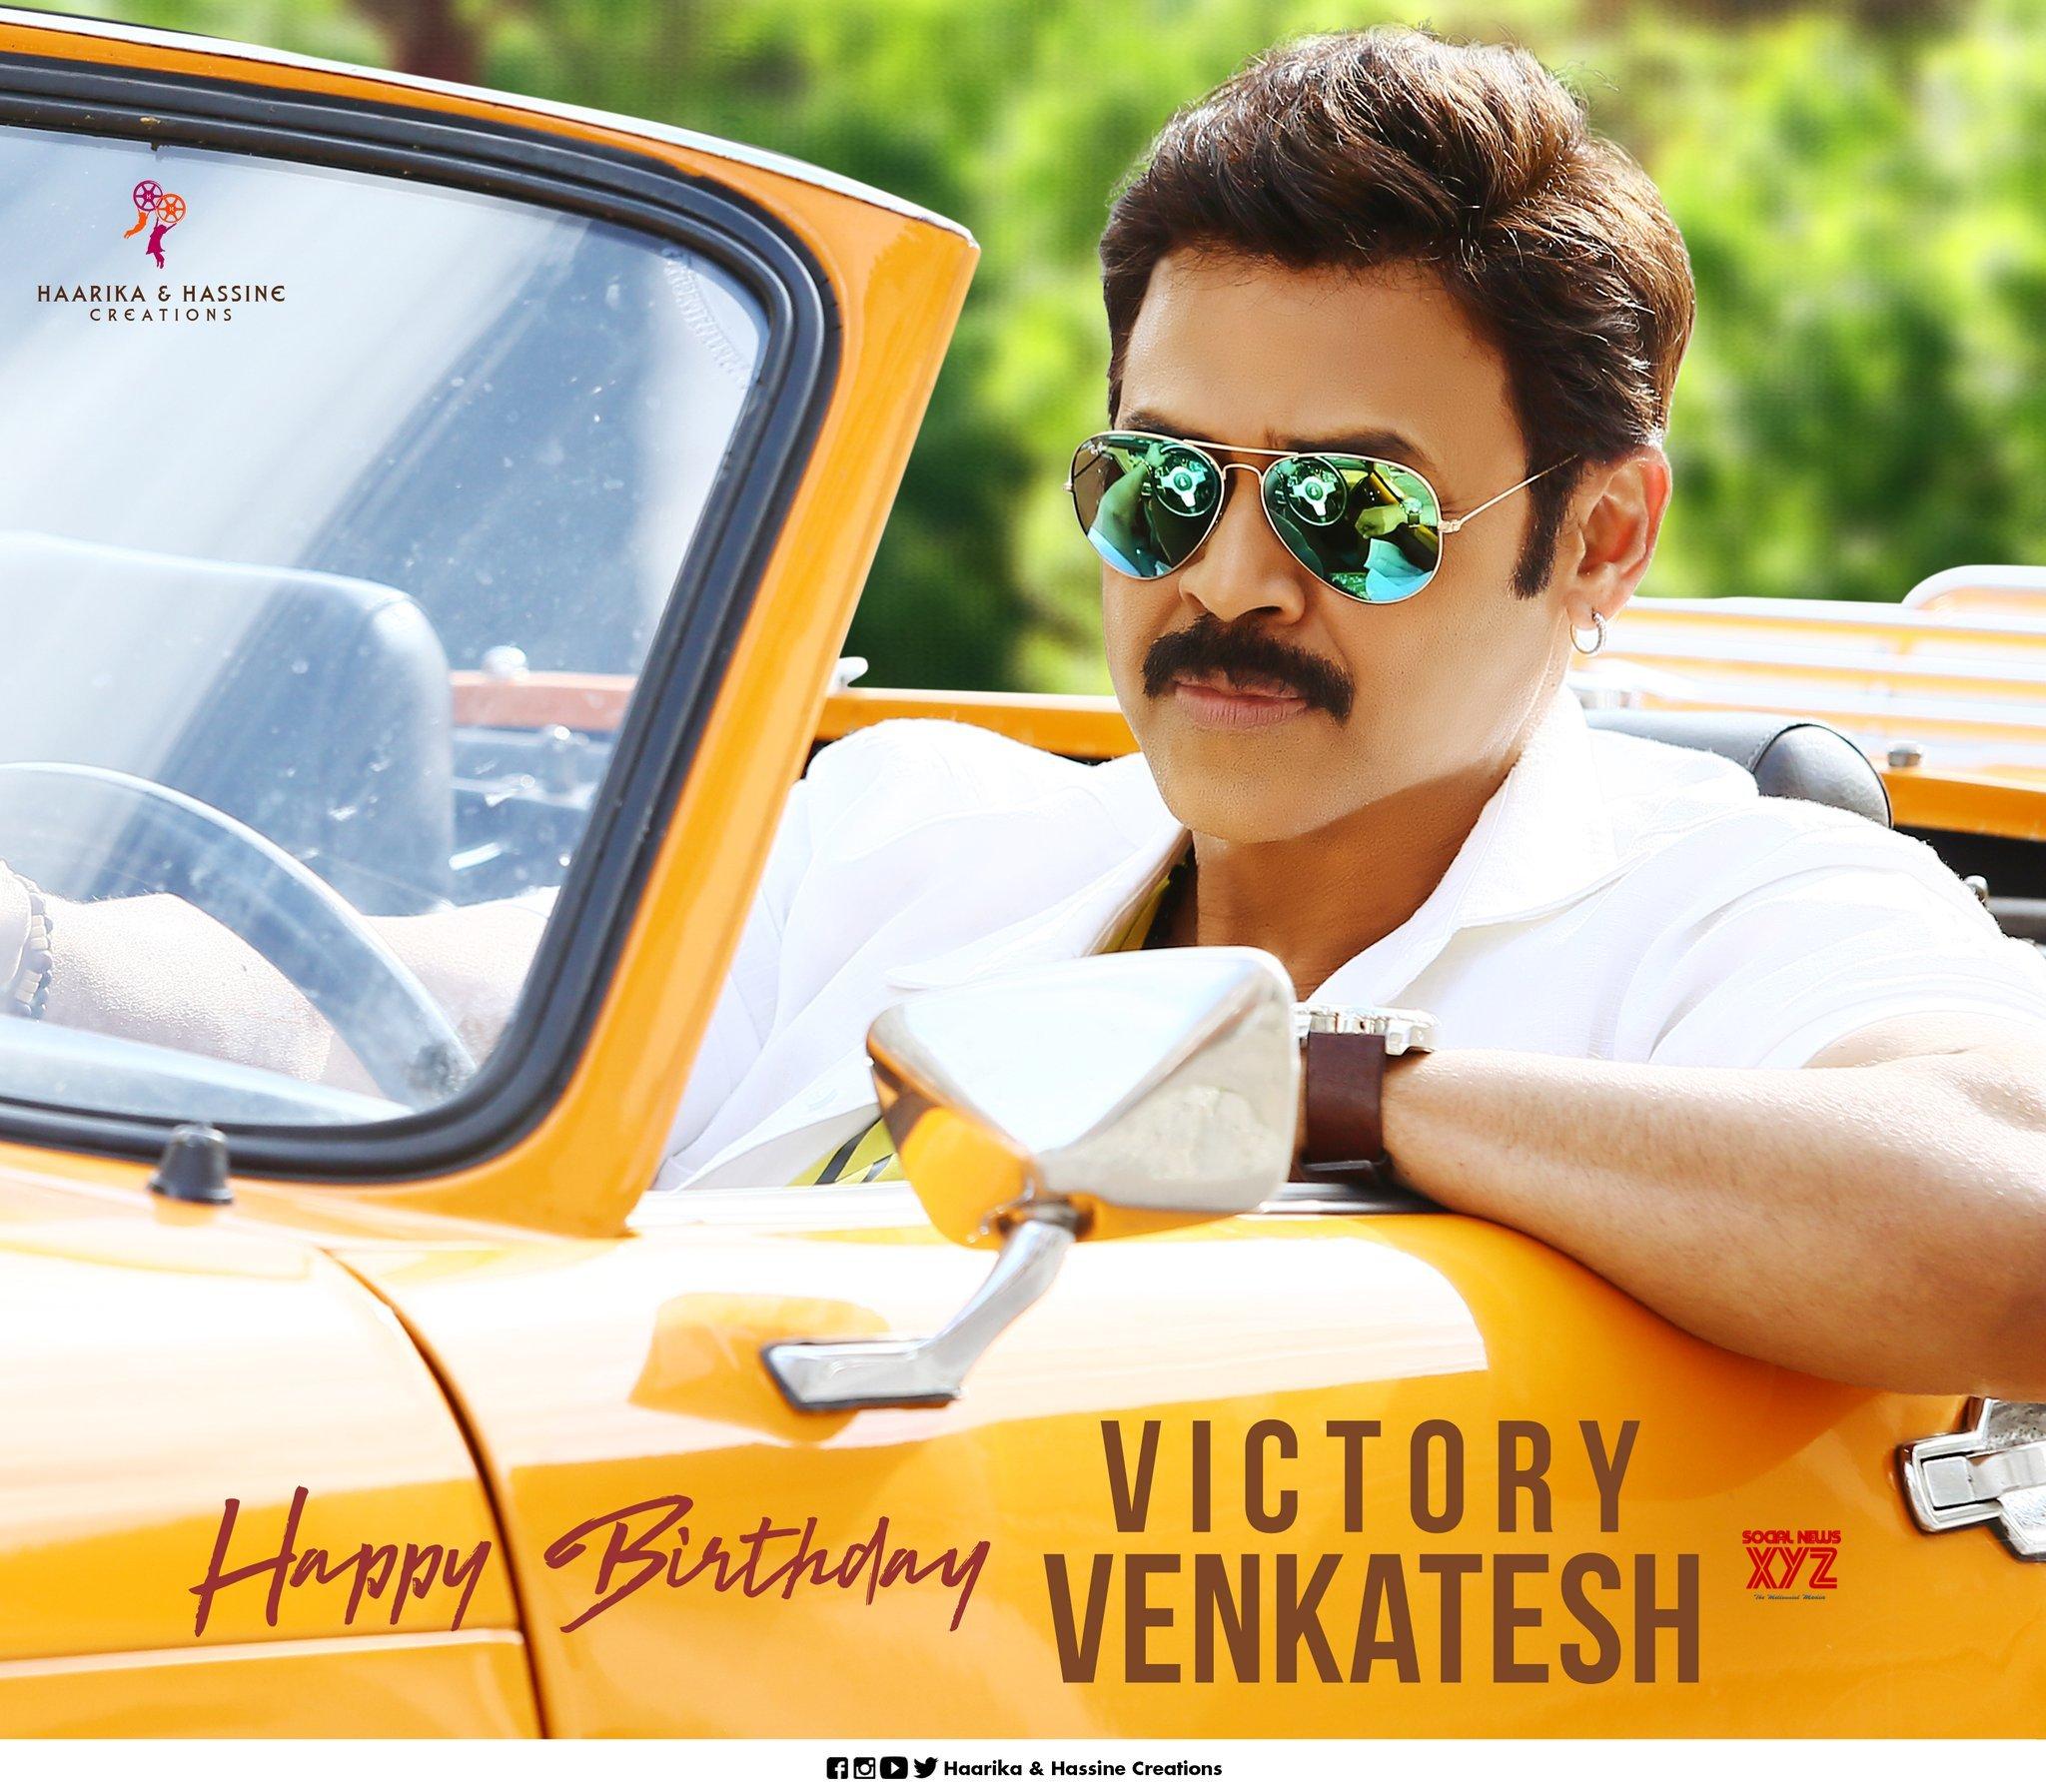 Happy Birthday Victory Venkatesh Poster From Haarika And Hassine Creations